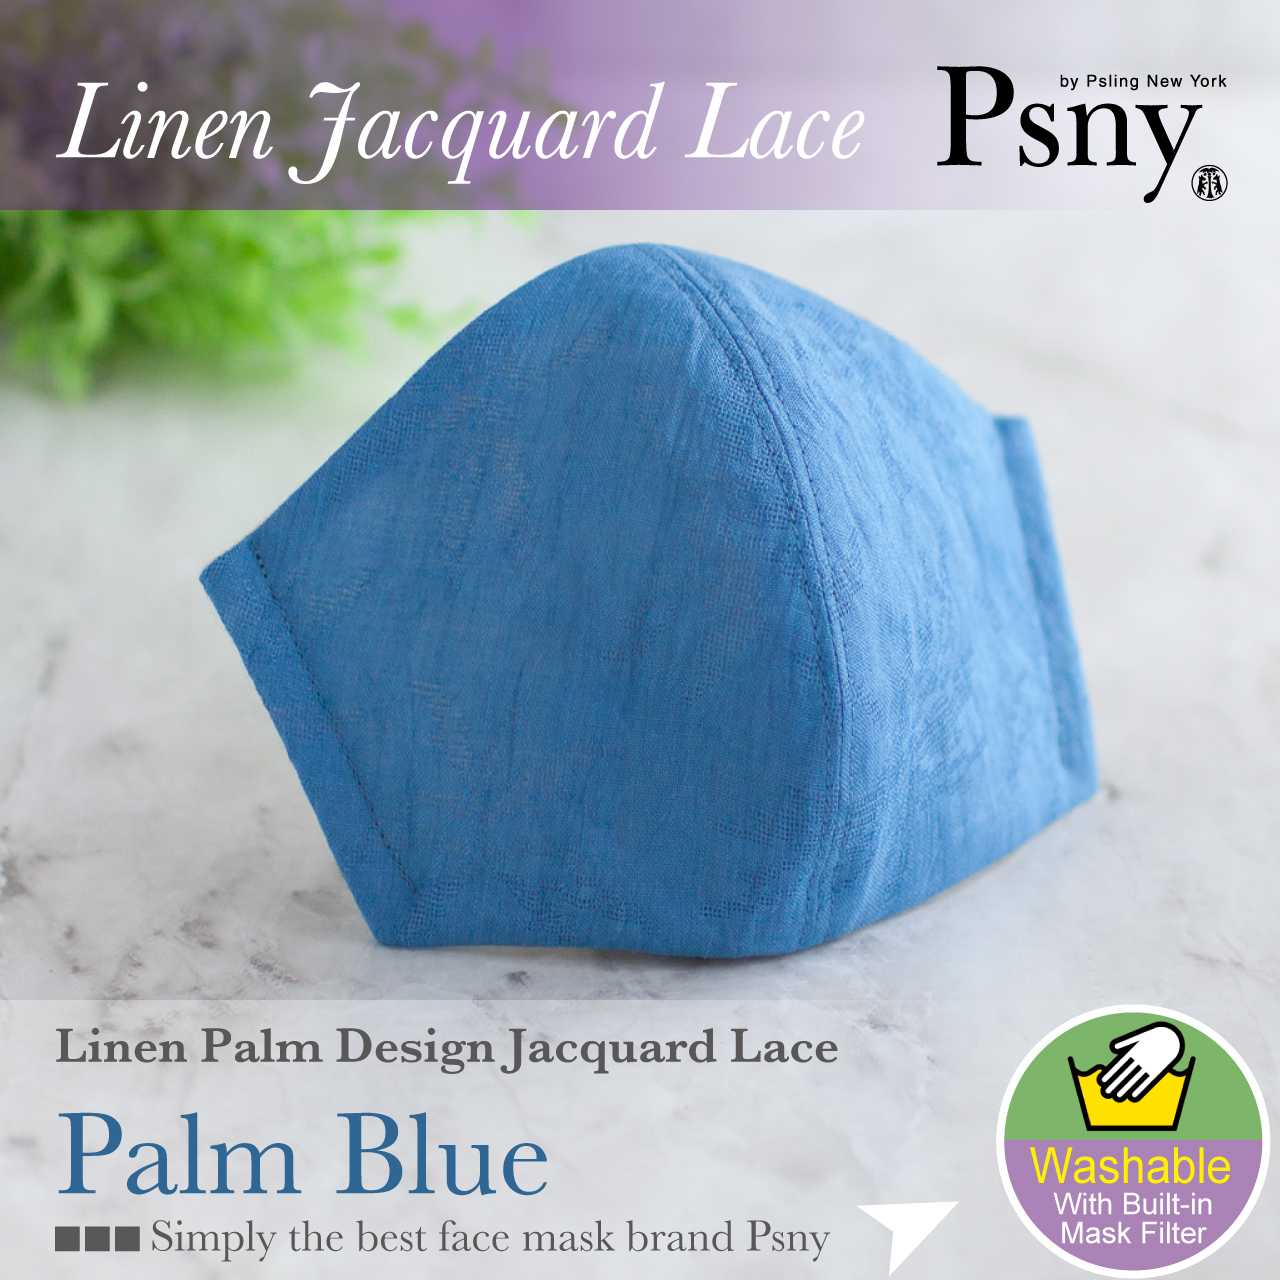 PSNY ジャガード リネン レース ブルー パーム 花粉 黄砂 不織布フィルター入り 大人 抗菌 立体 マスク 送料無料 P16